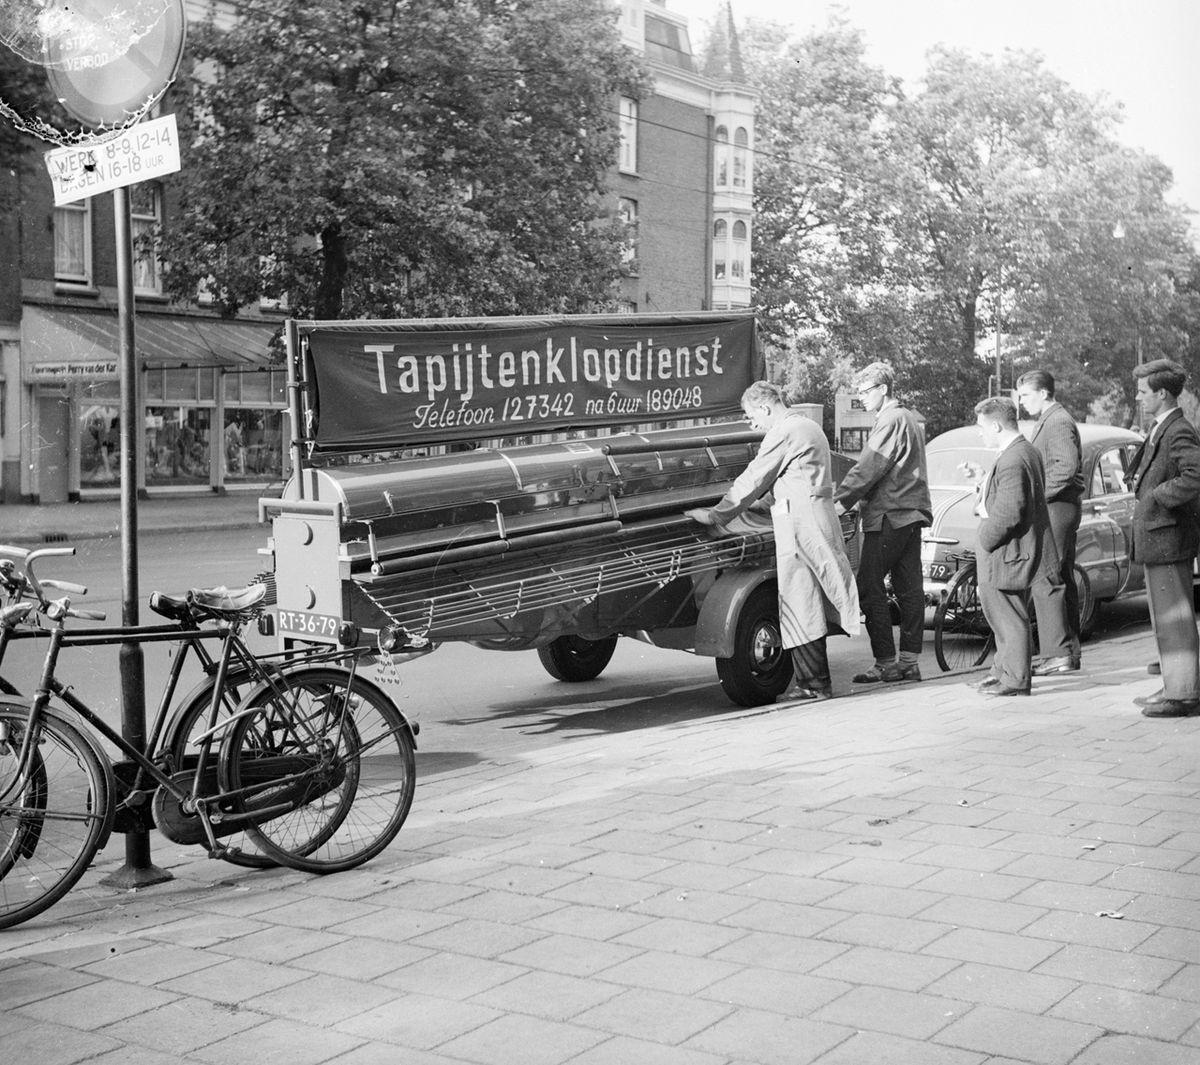 Teppichklopfmaschine – Wikipedia